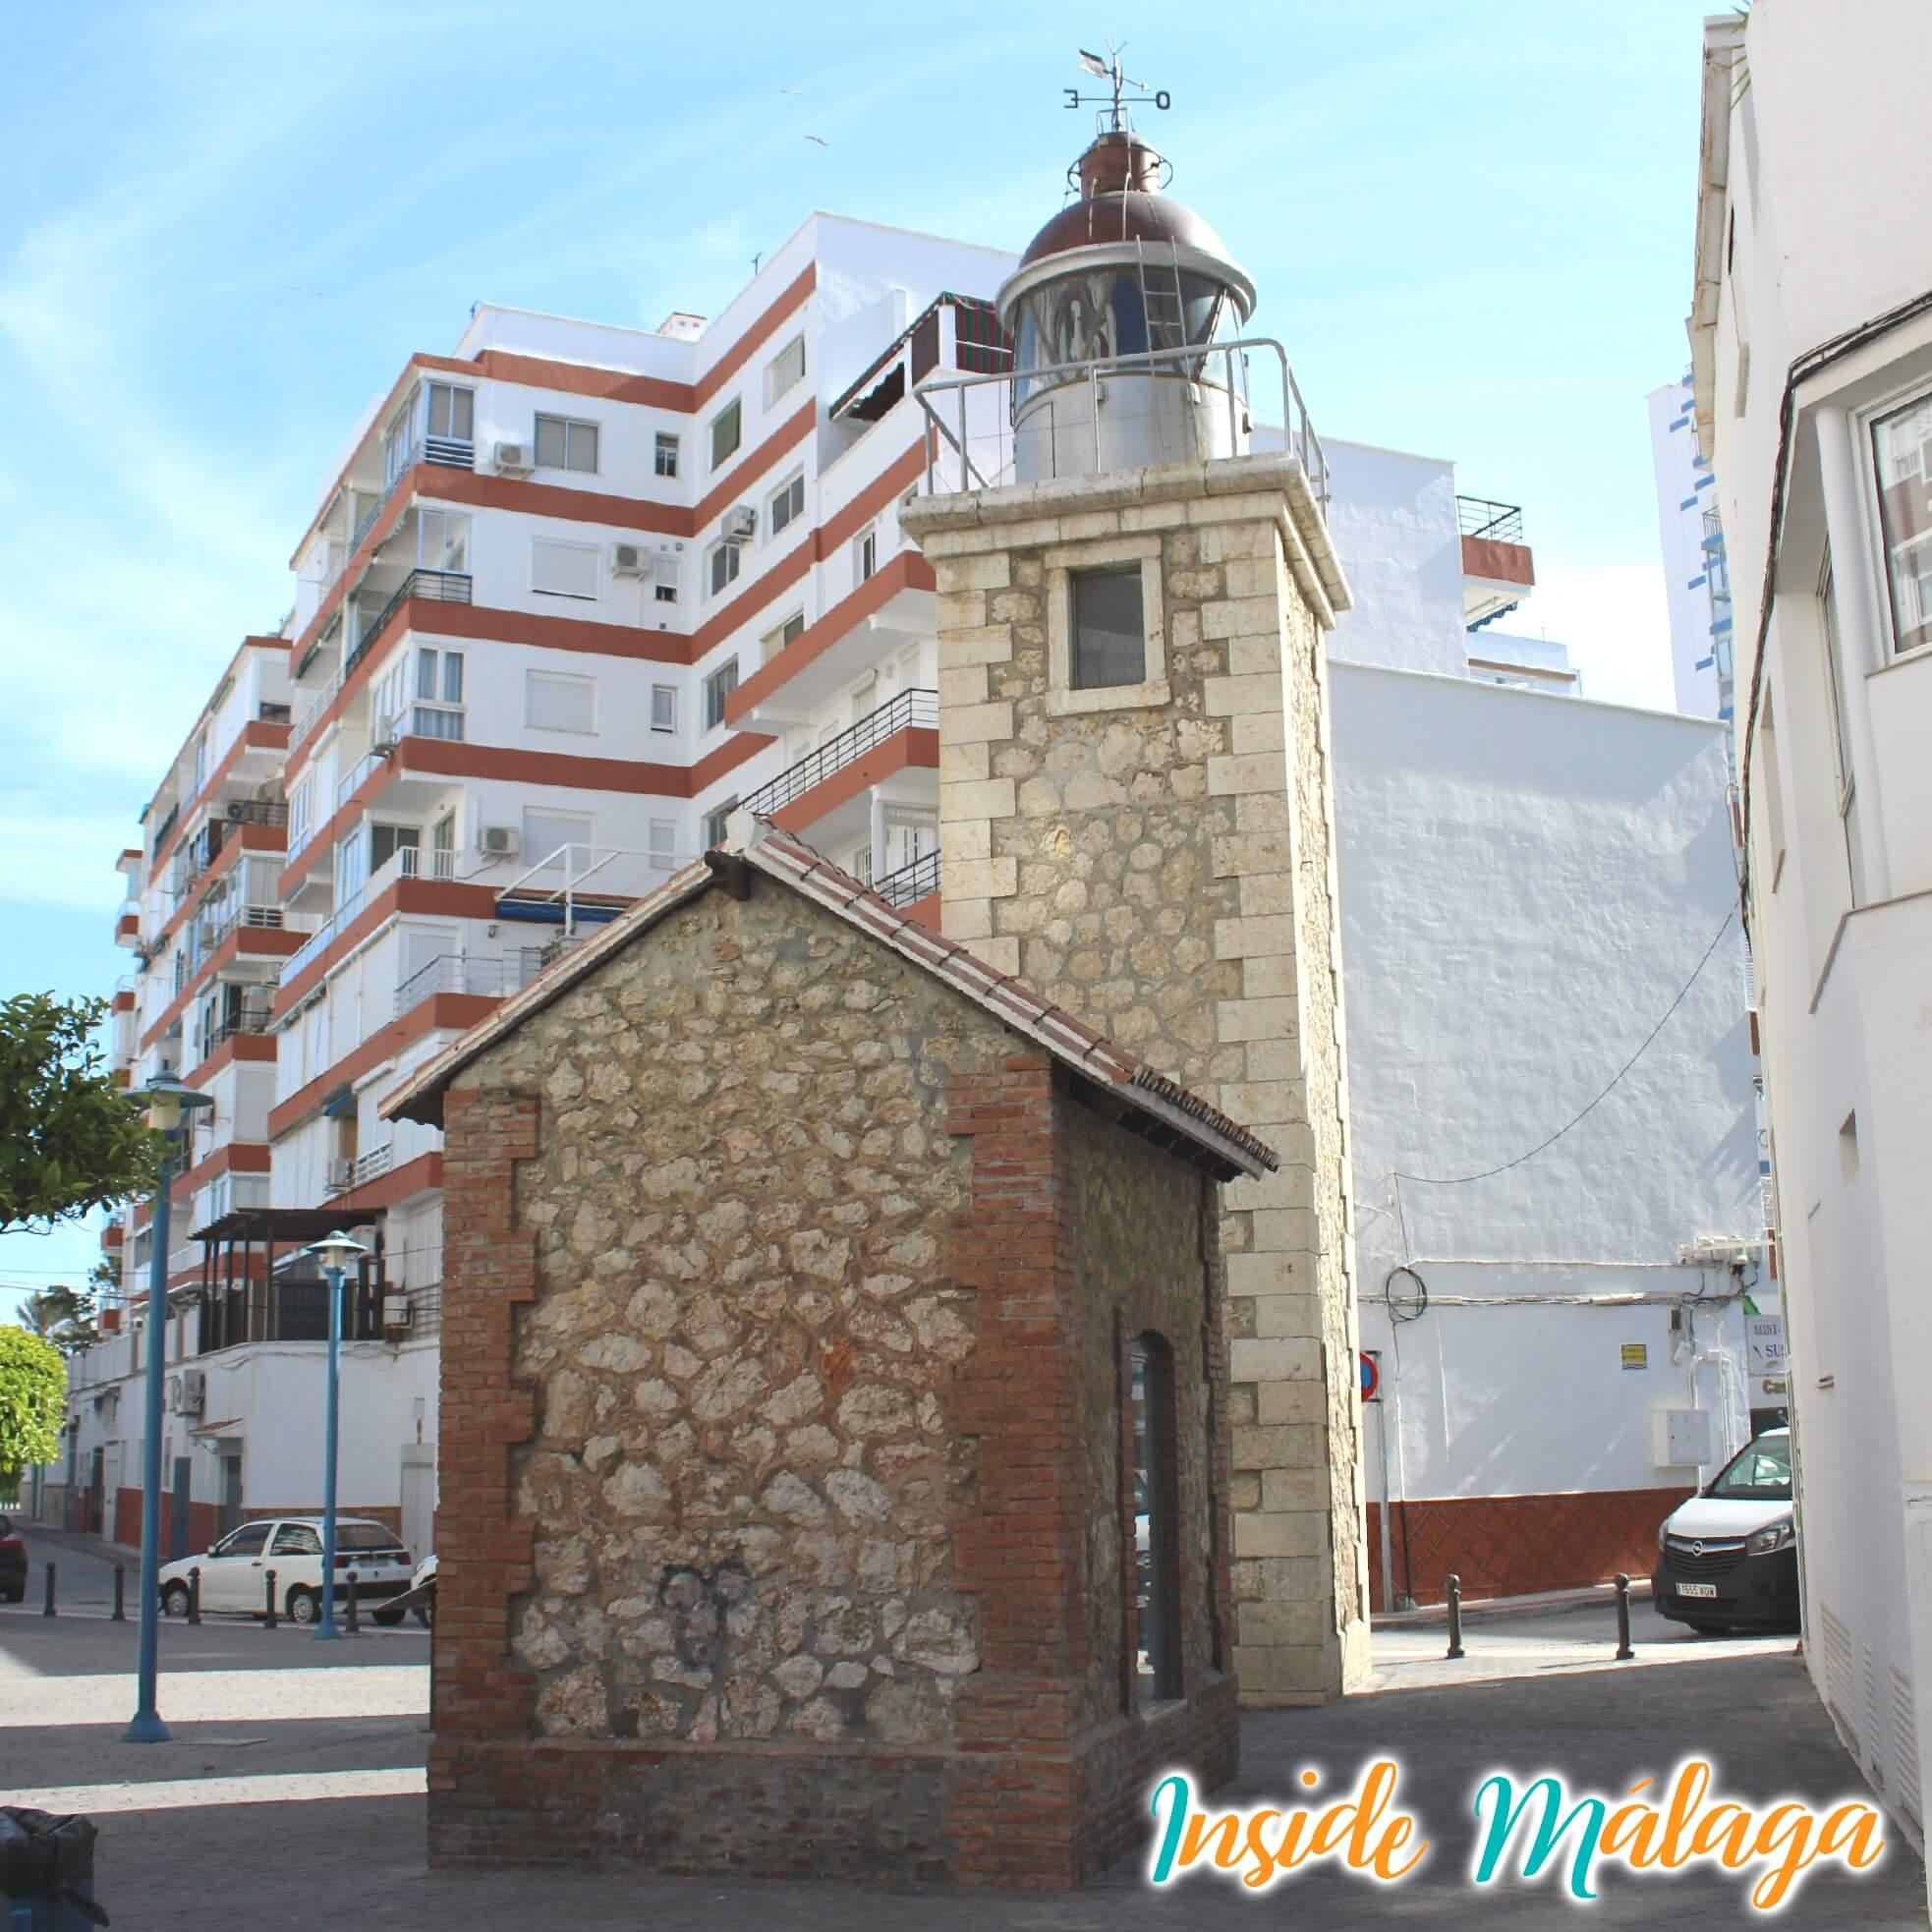 Lighttower Tore Tore Torre del Mar Velez Malaga